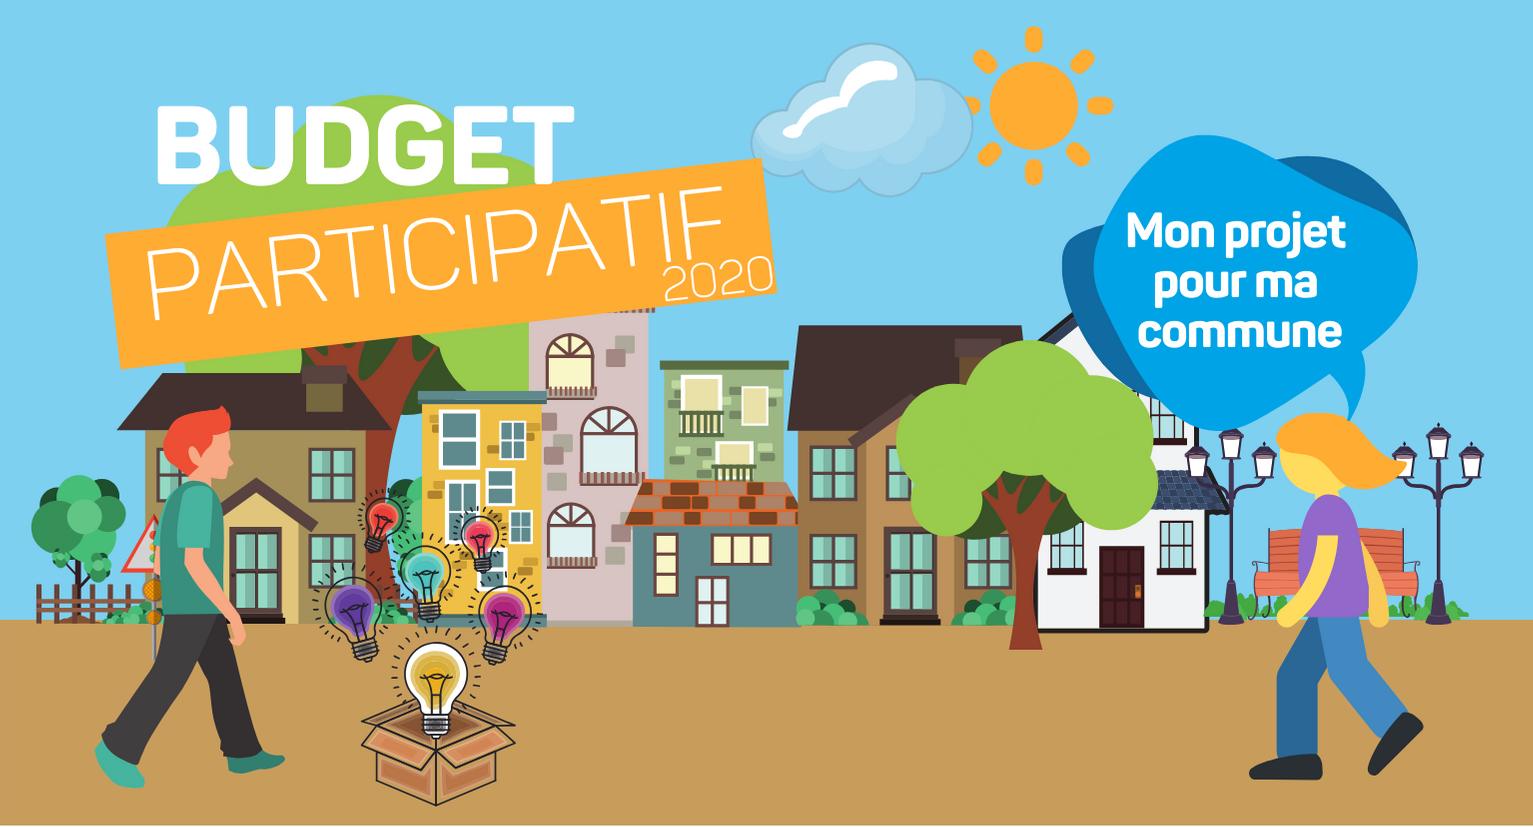 Un budget participatif à Woluwe-Saint-Lambert